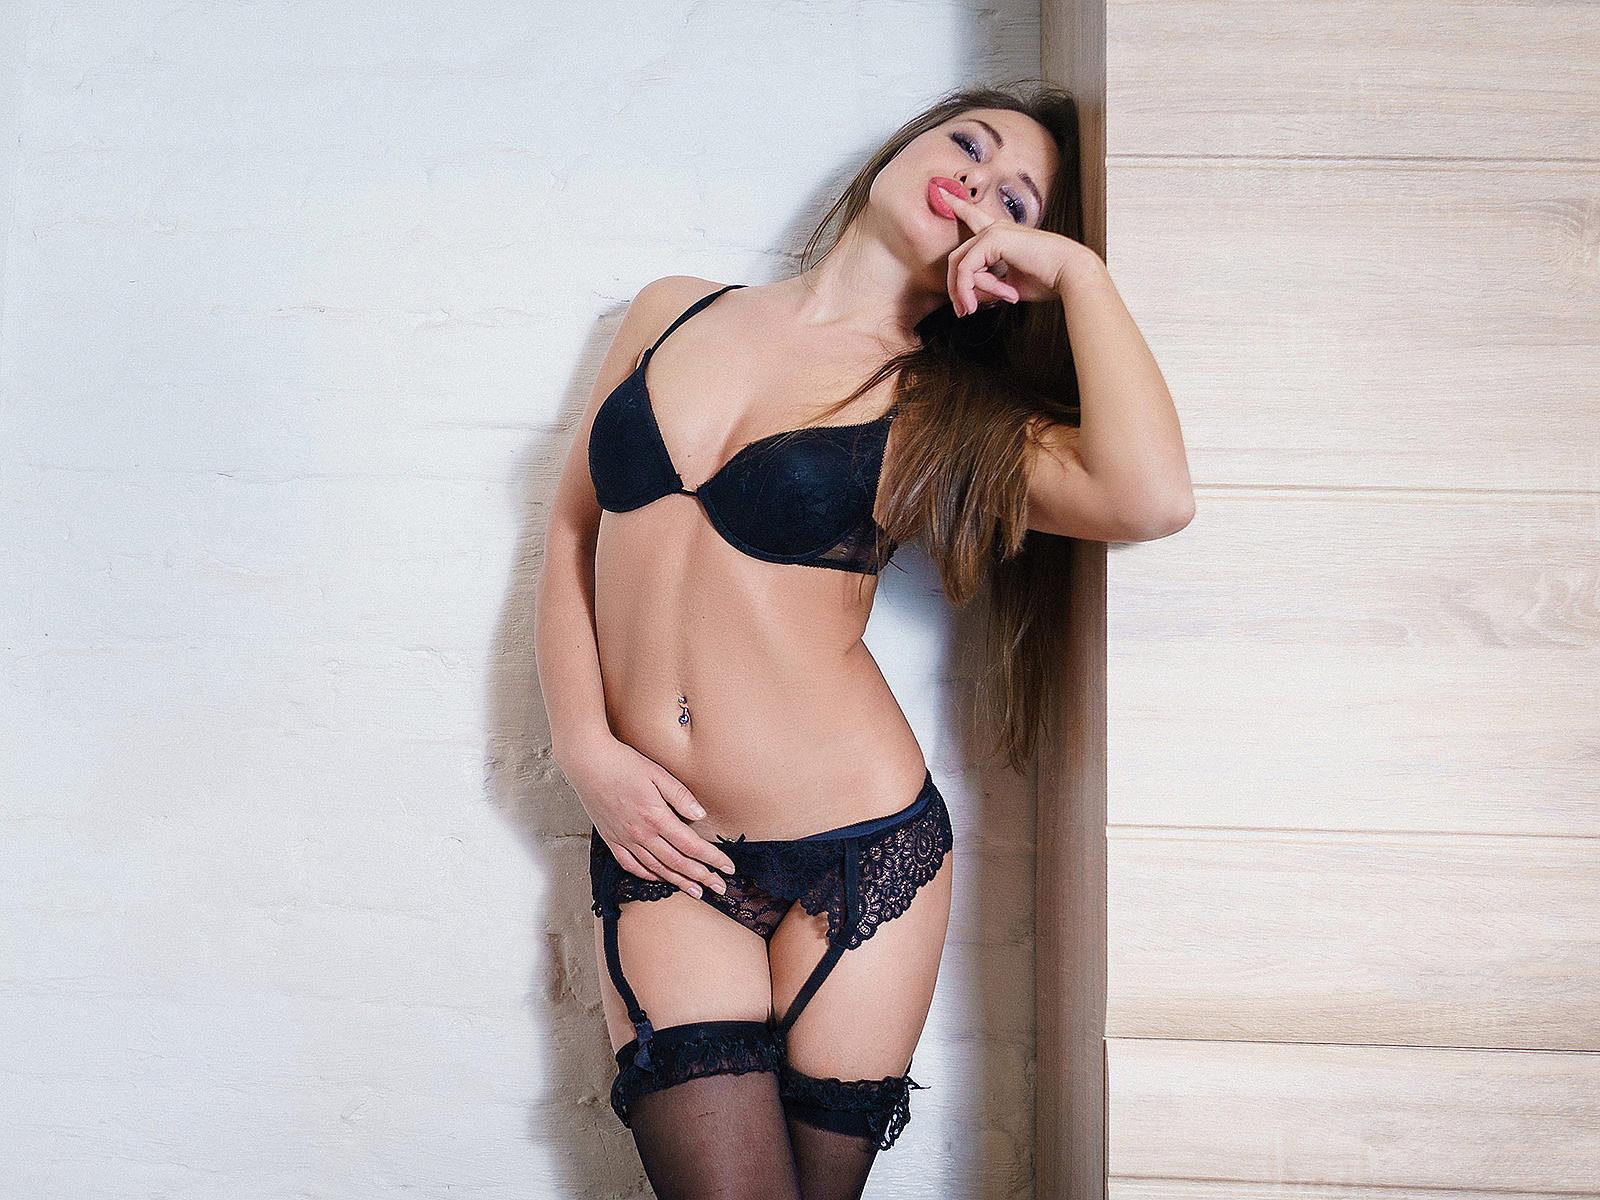 SandraShy